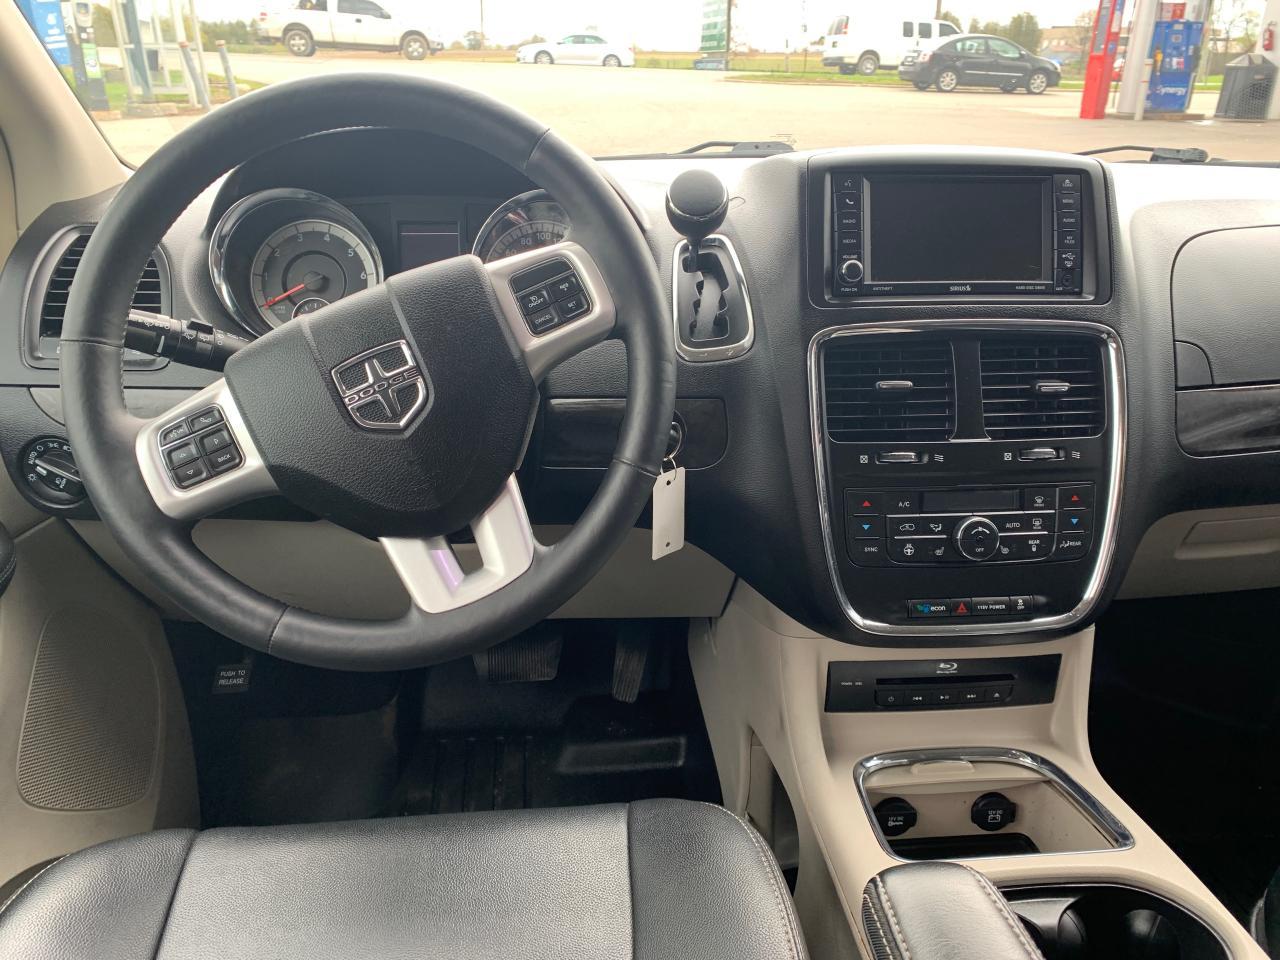 2016 Dodge Grand Caravan Crew Plus stownandgo